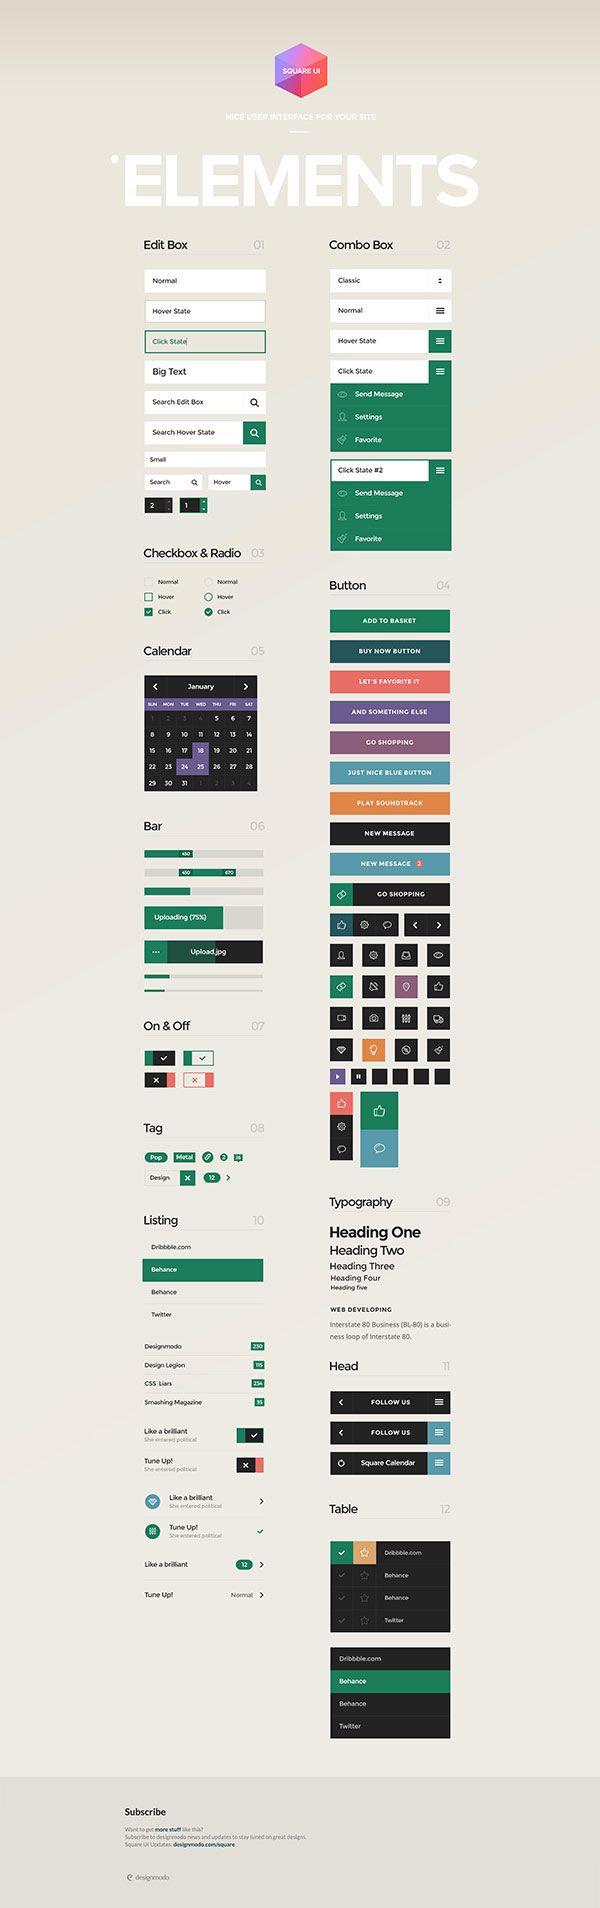 square-elements.jpg 600×1908 pixels